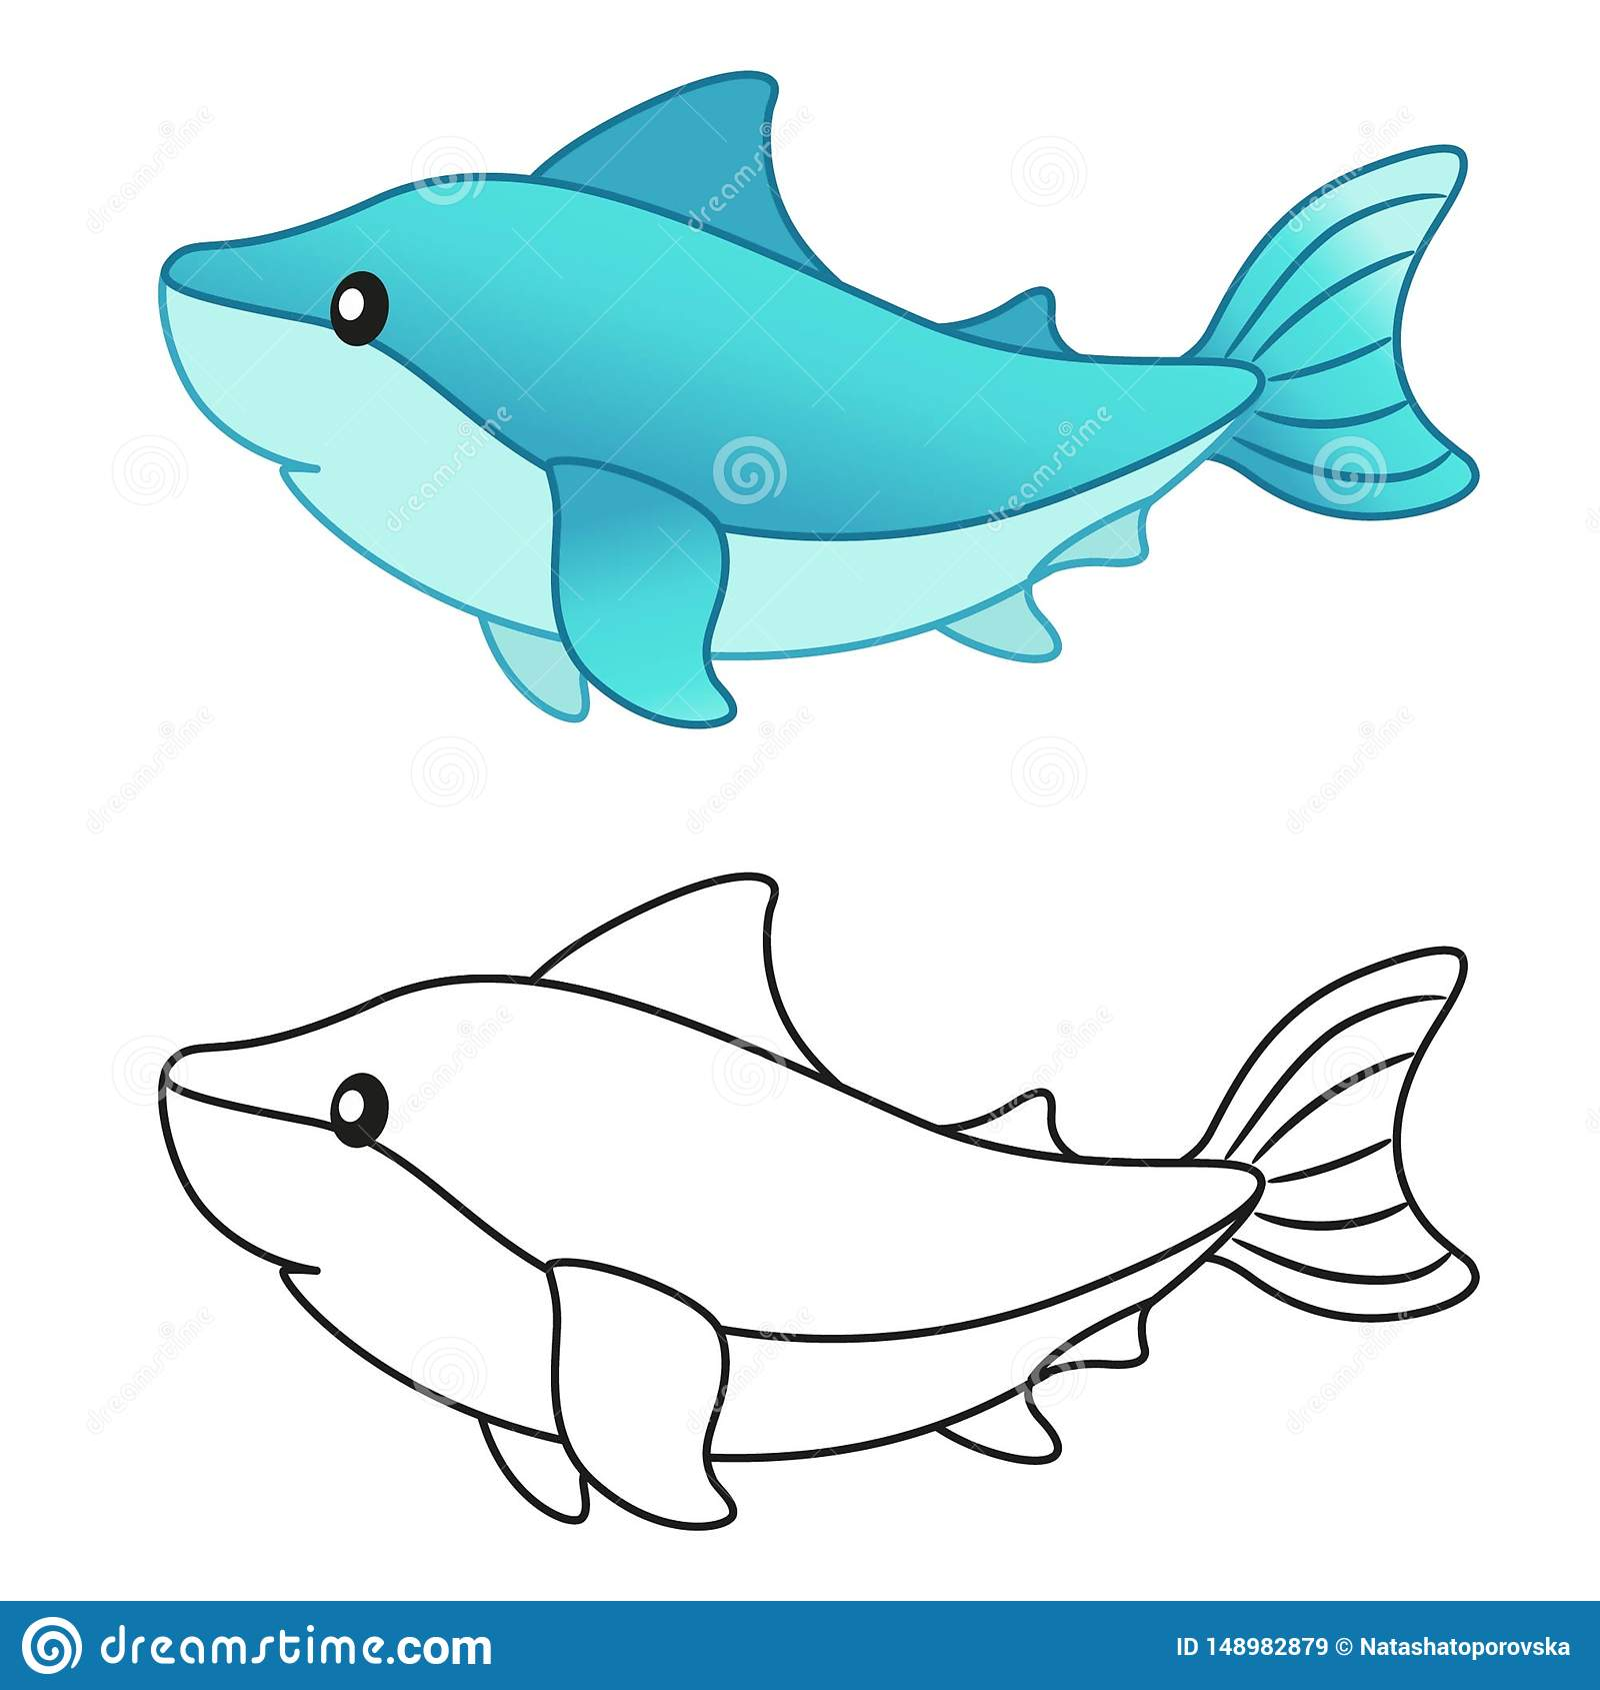 Shark Coloring Stock Illustrations – 18 Shark Coloring Stock ...